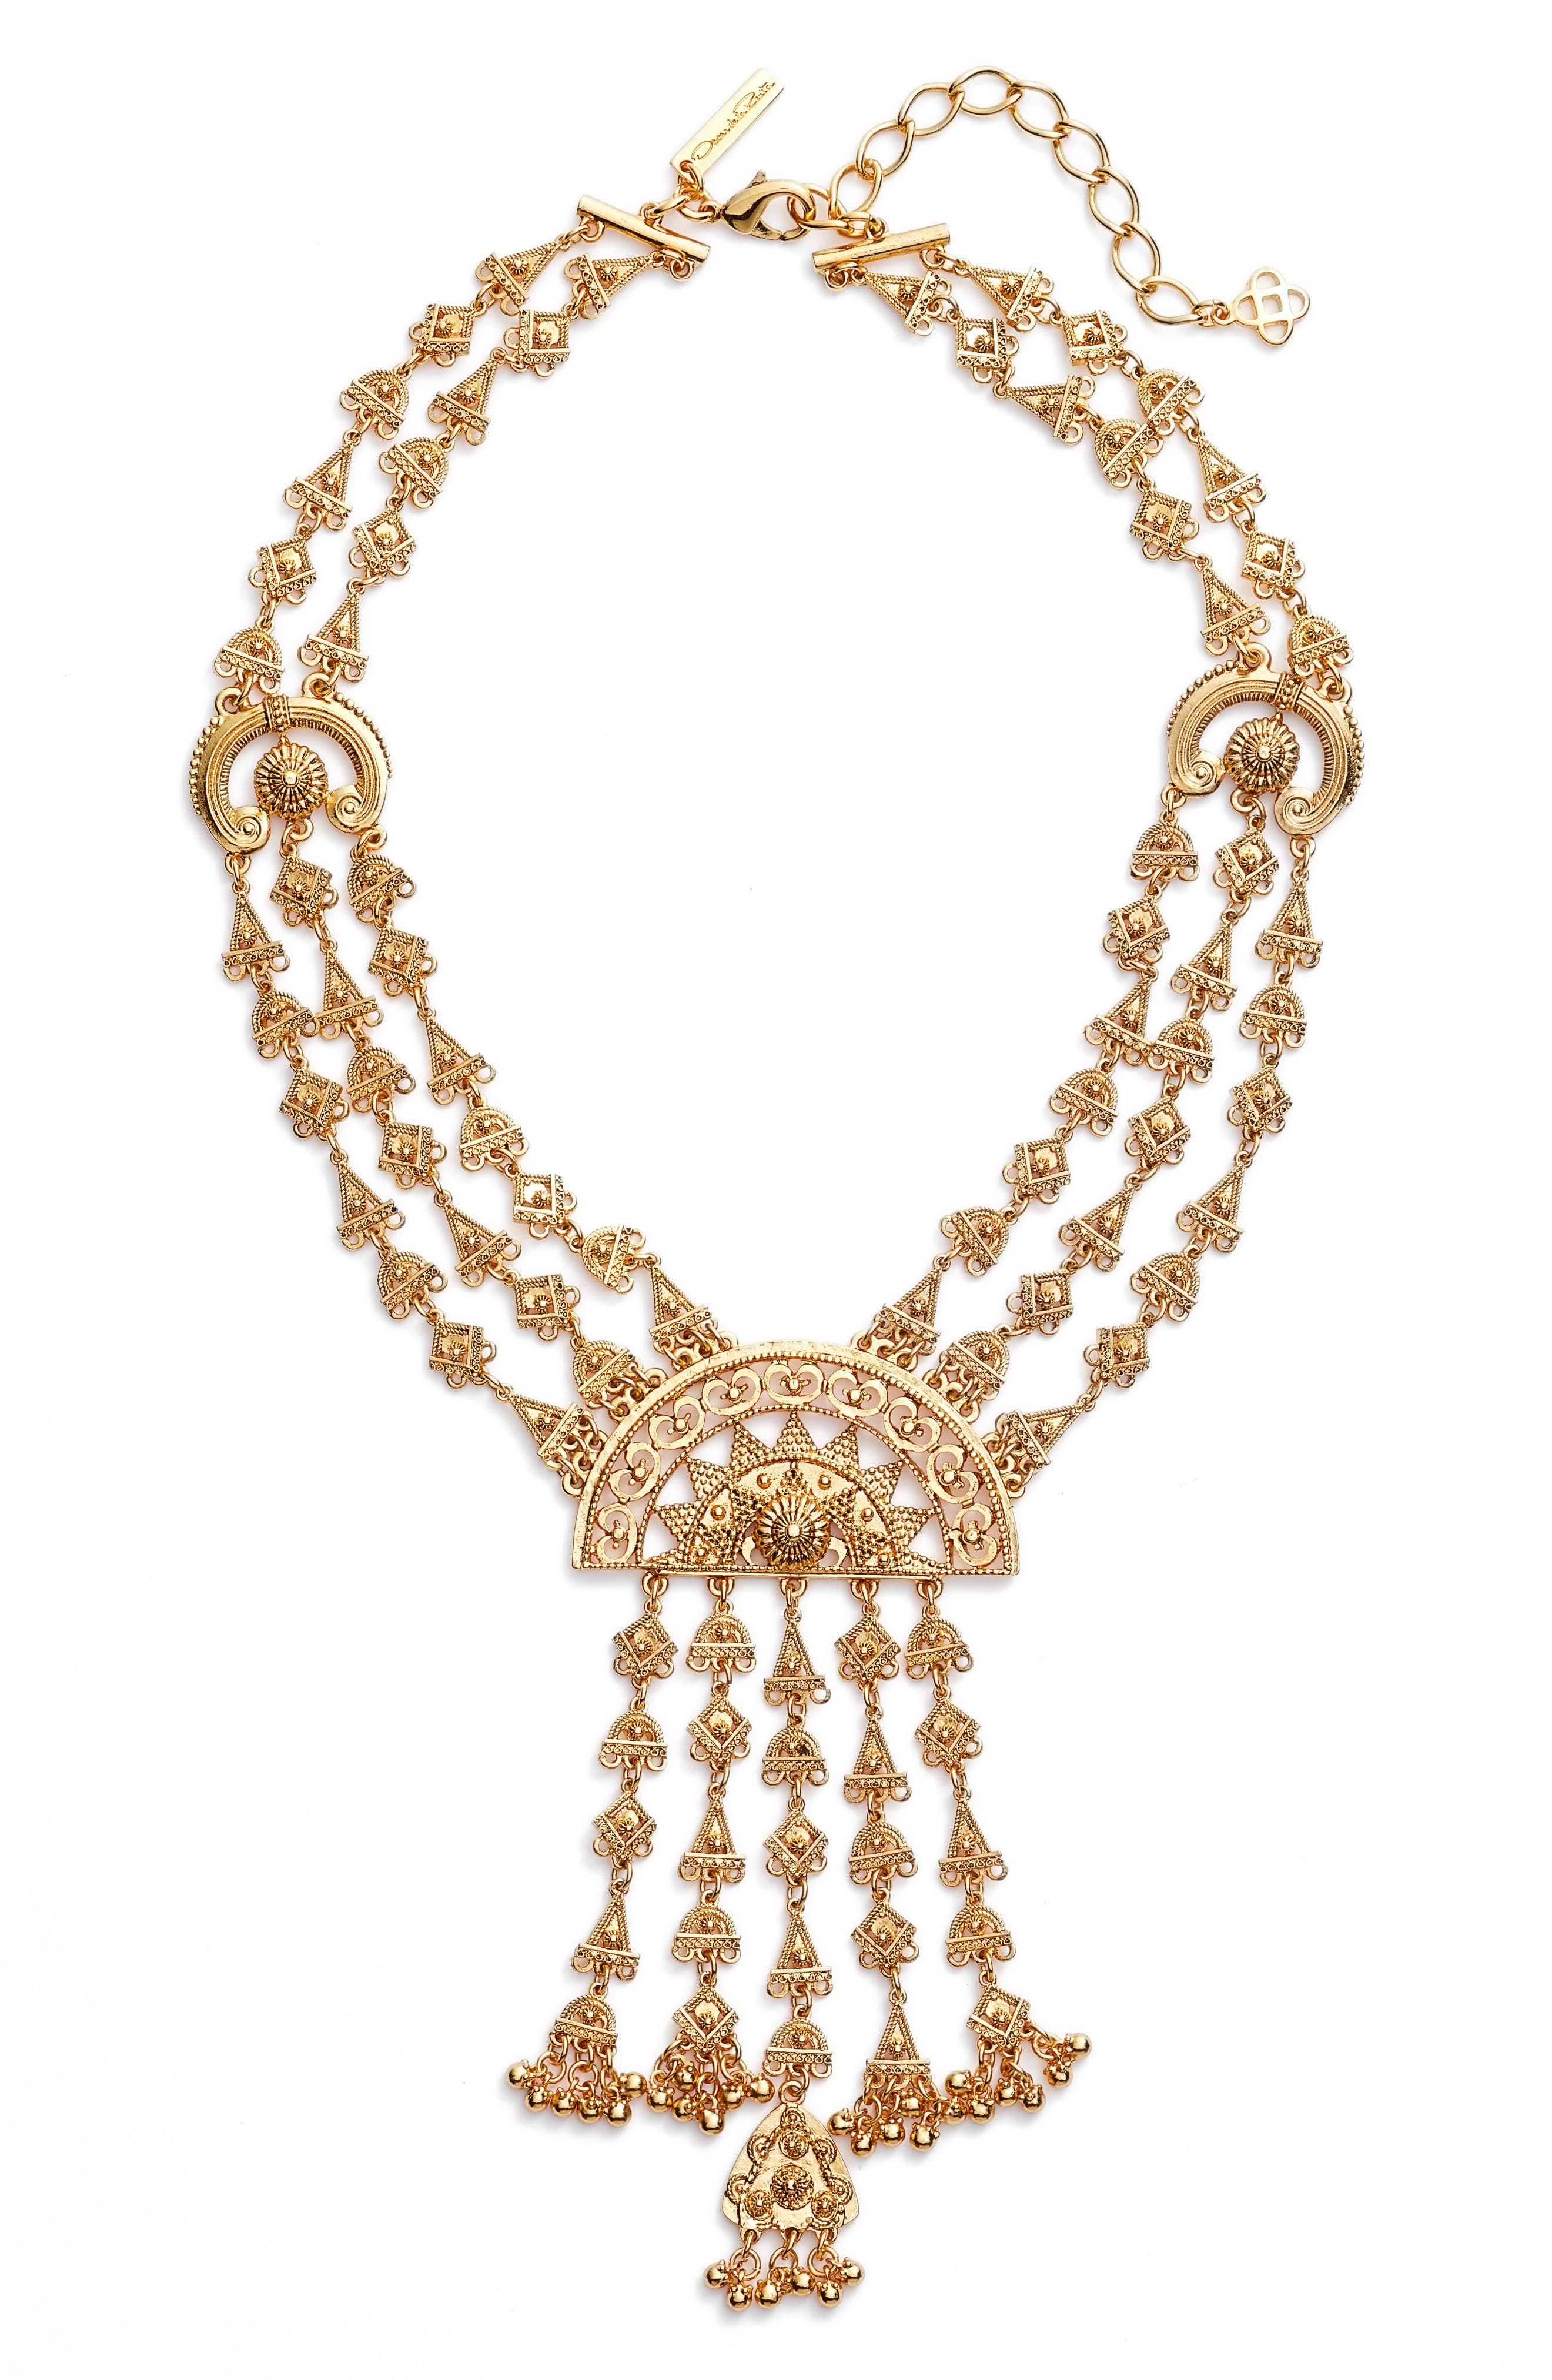 Alternate Image 1 Selected - Oscar de la Renta Ornate Charm Necklace